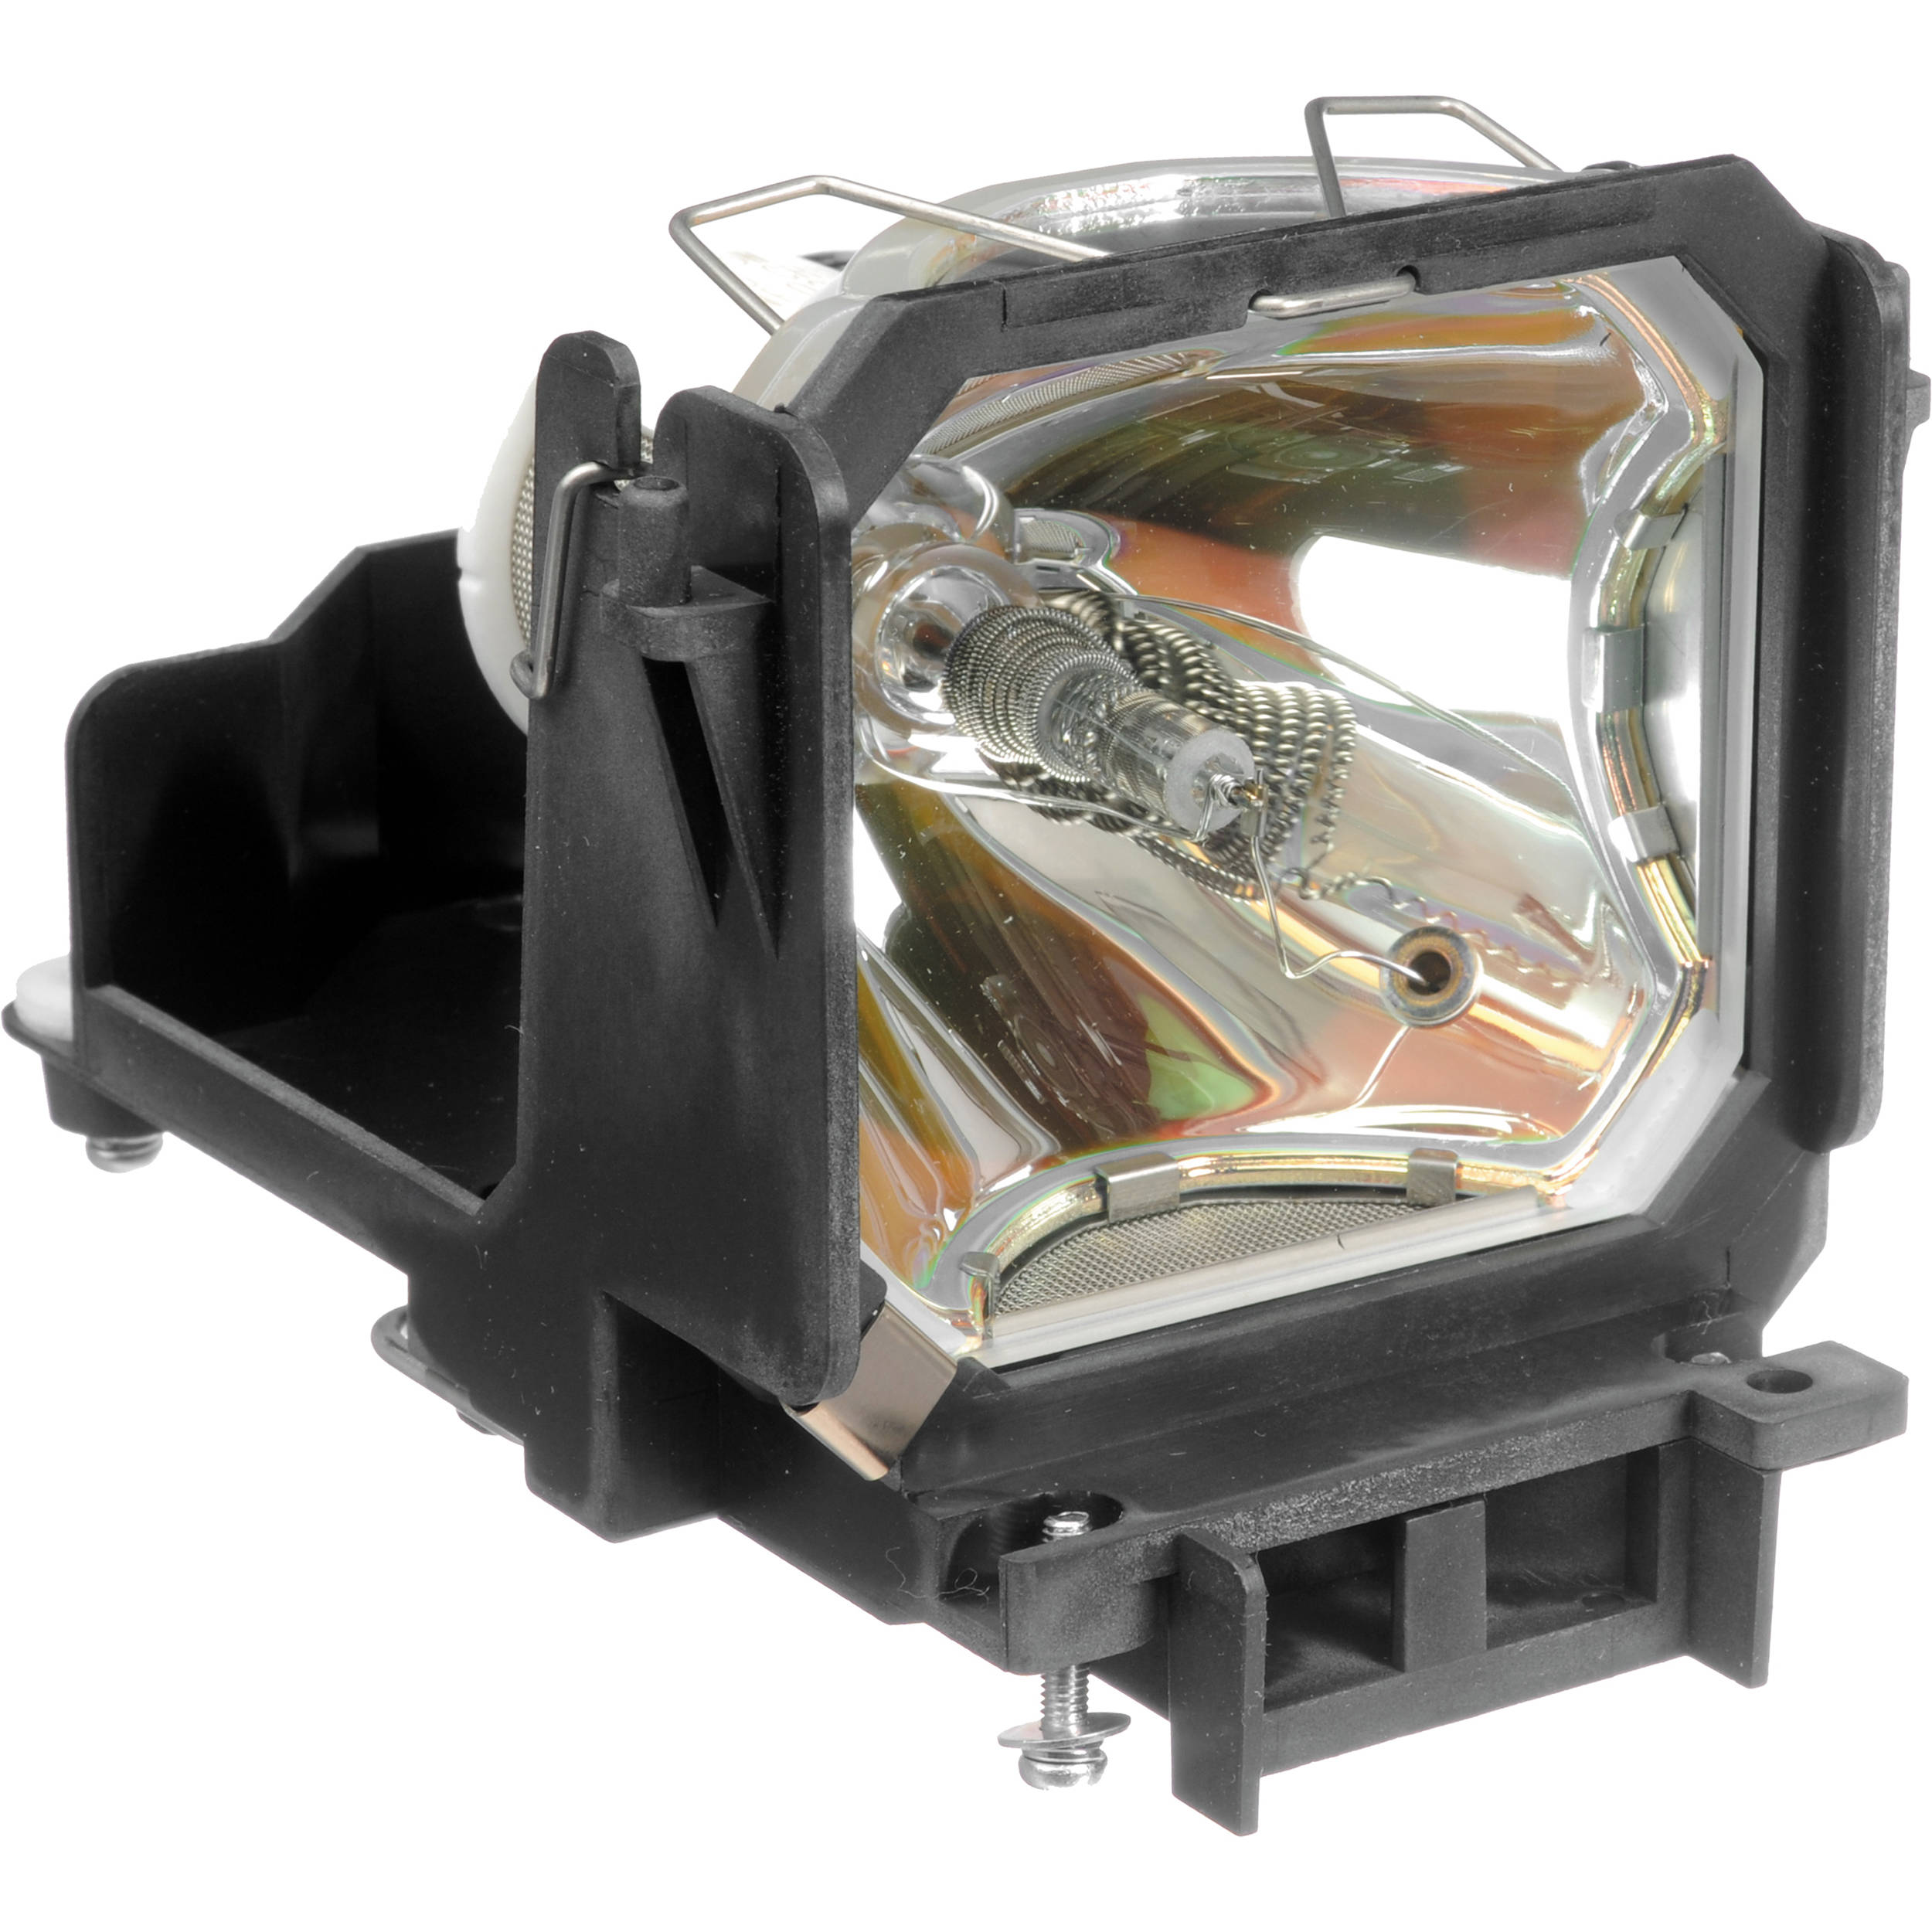 Sony LMP-P260 Projector Lamp LMP-P260 B&H Photo Video